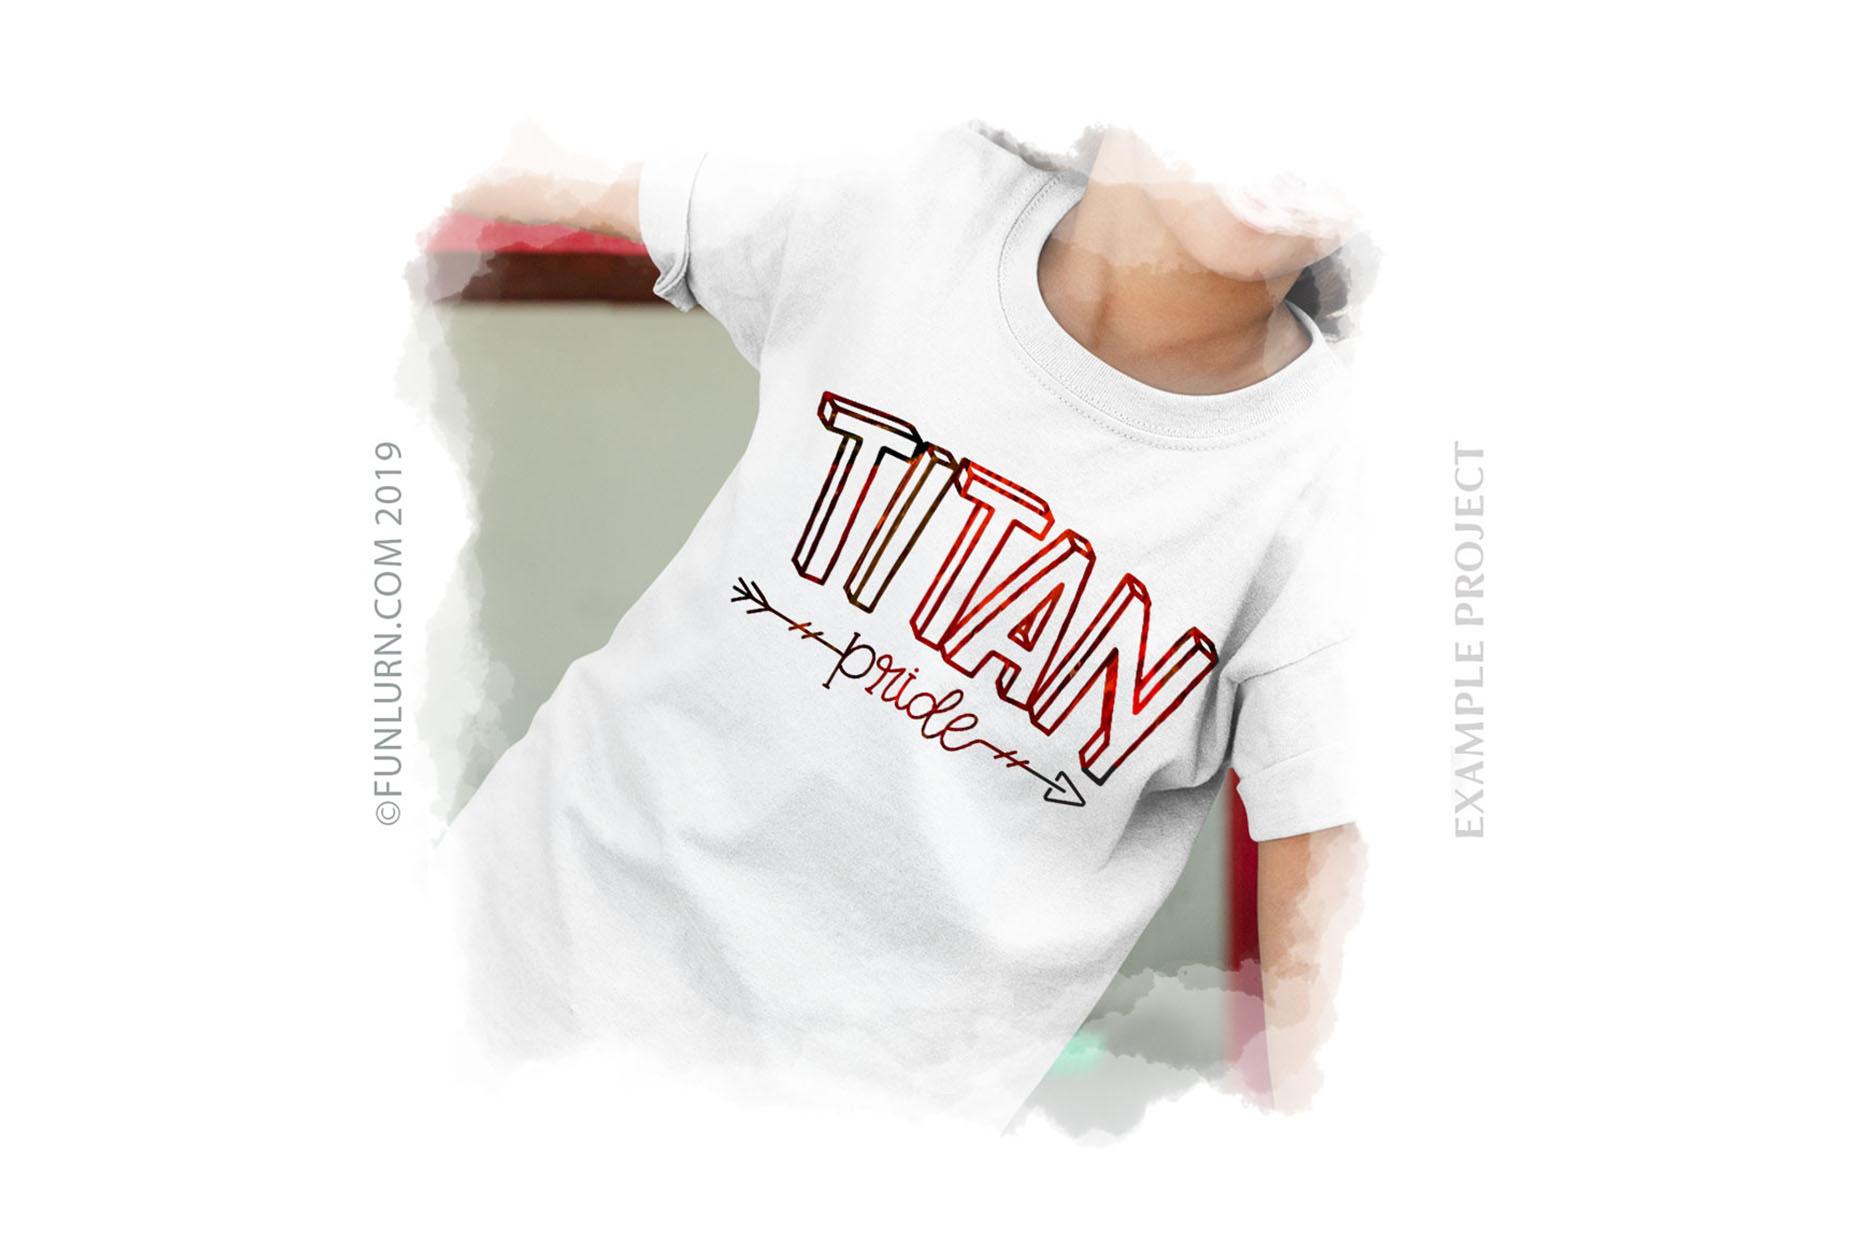 Titan Pride Team SVG Cut File example image 3